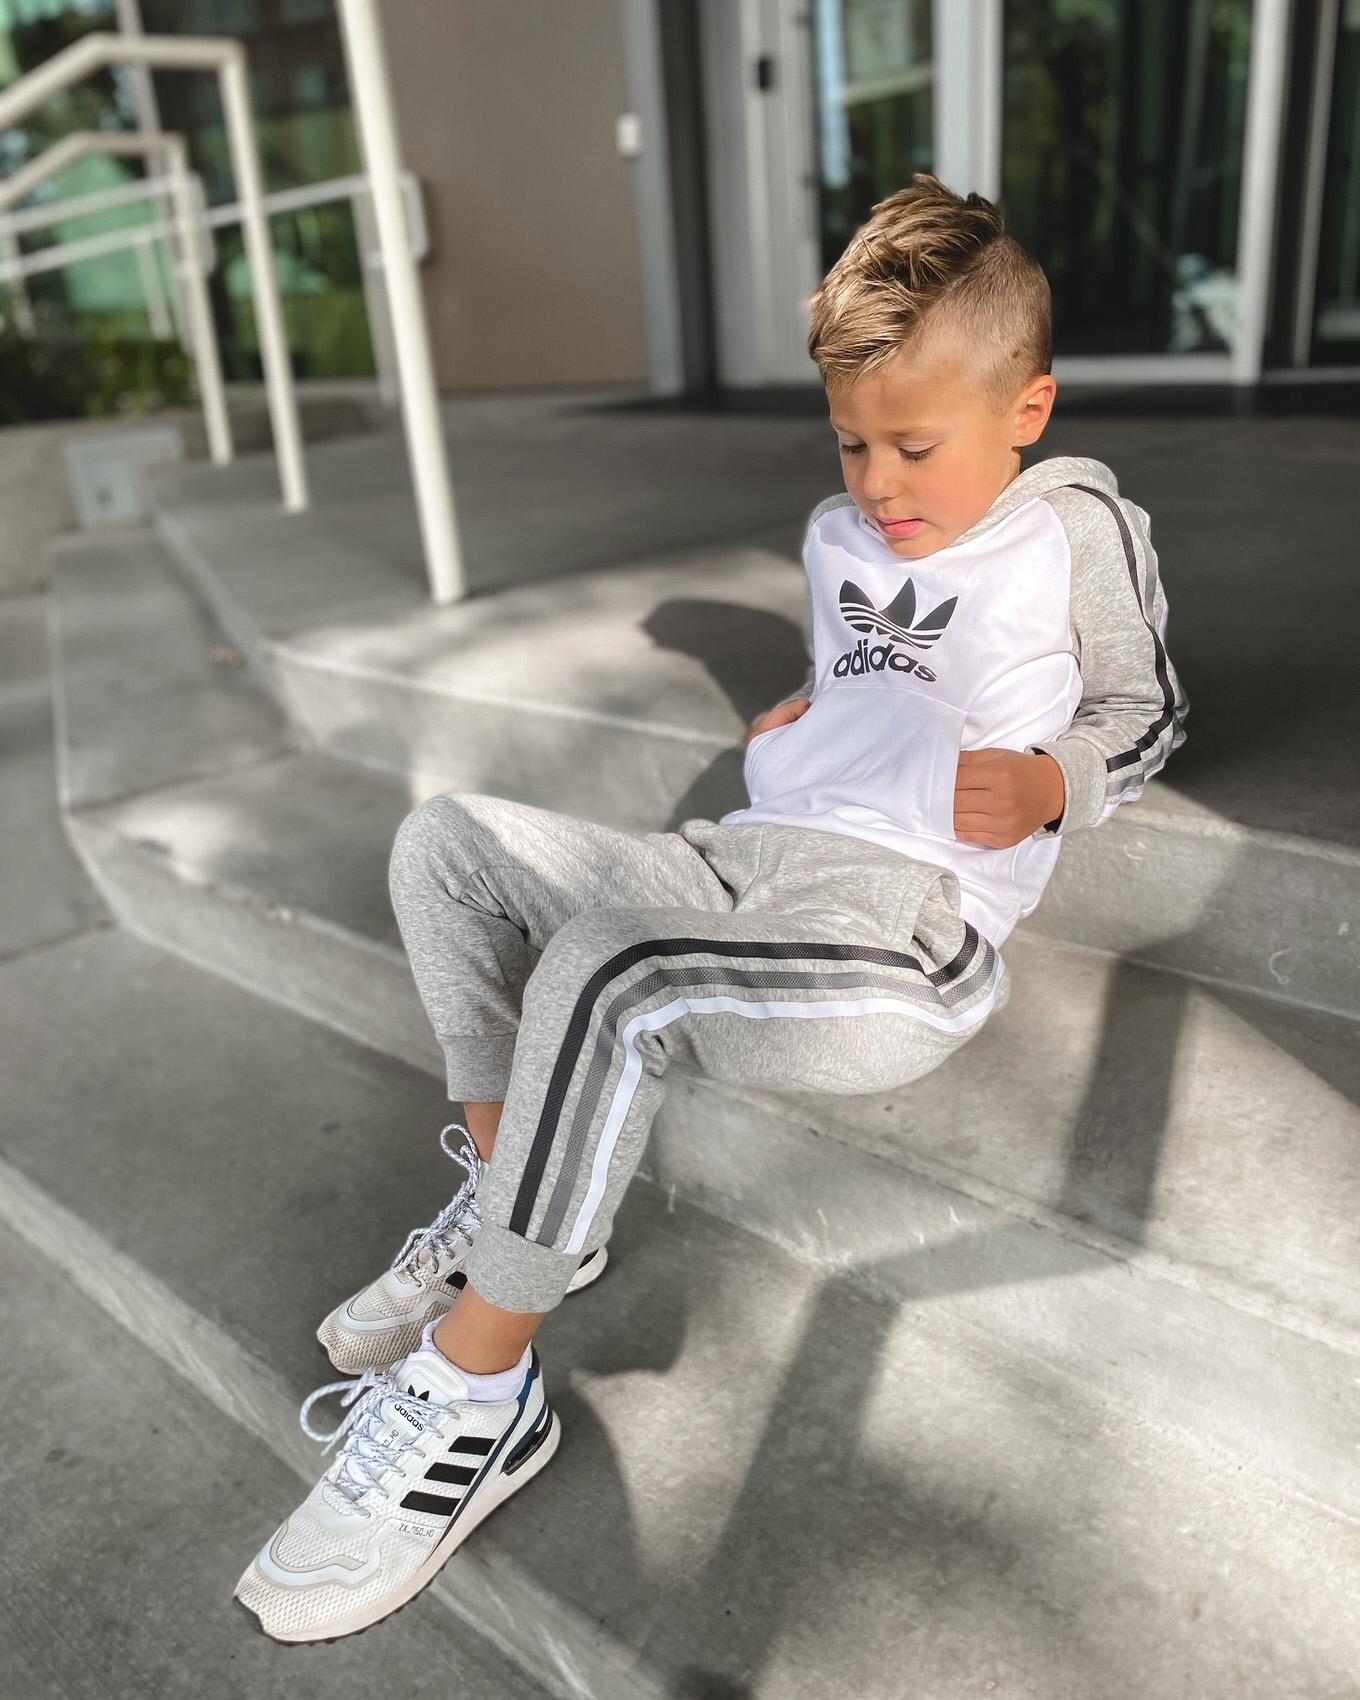 adidas kids style